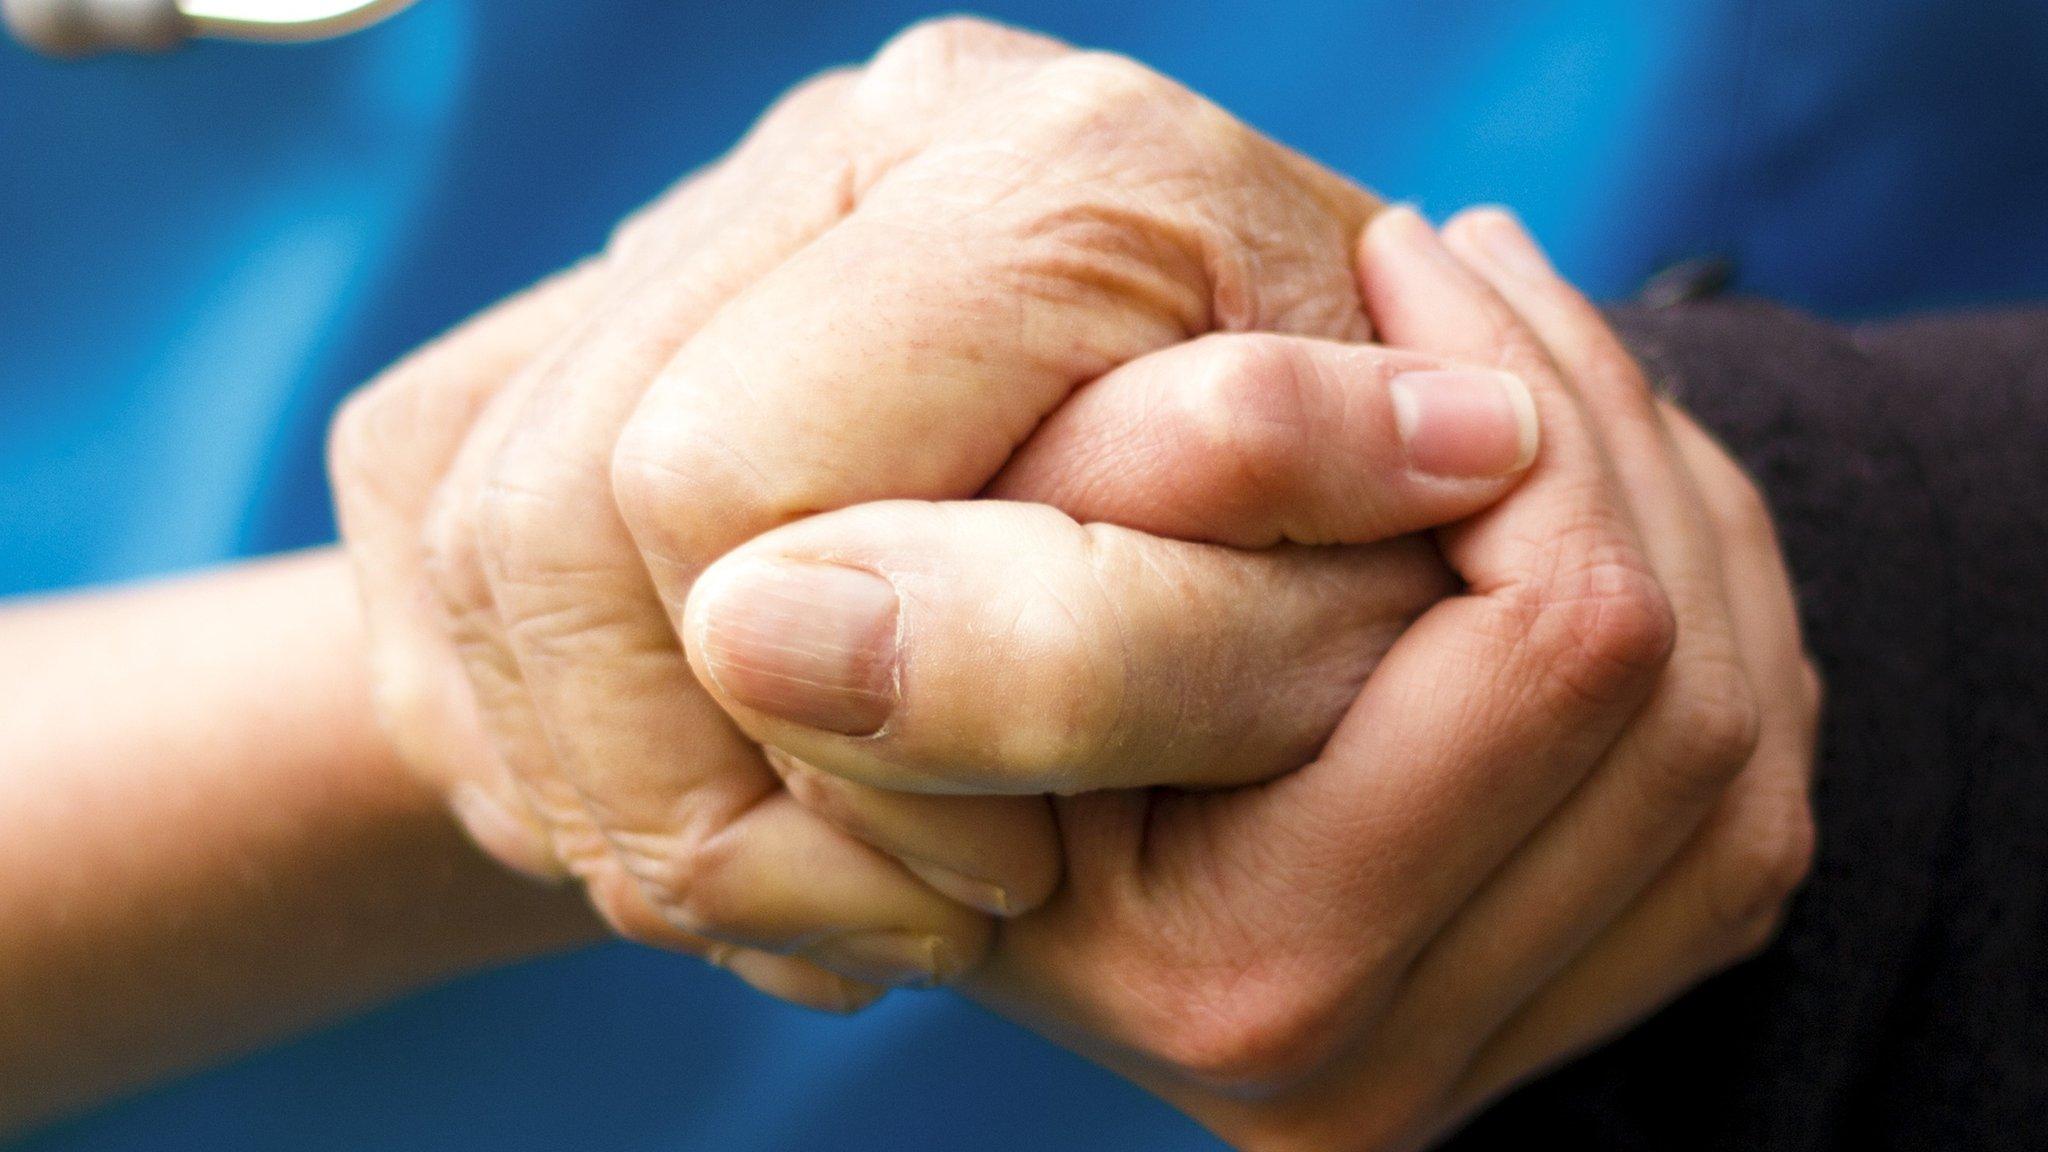 Parkinson's disease 'may start in gut'